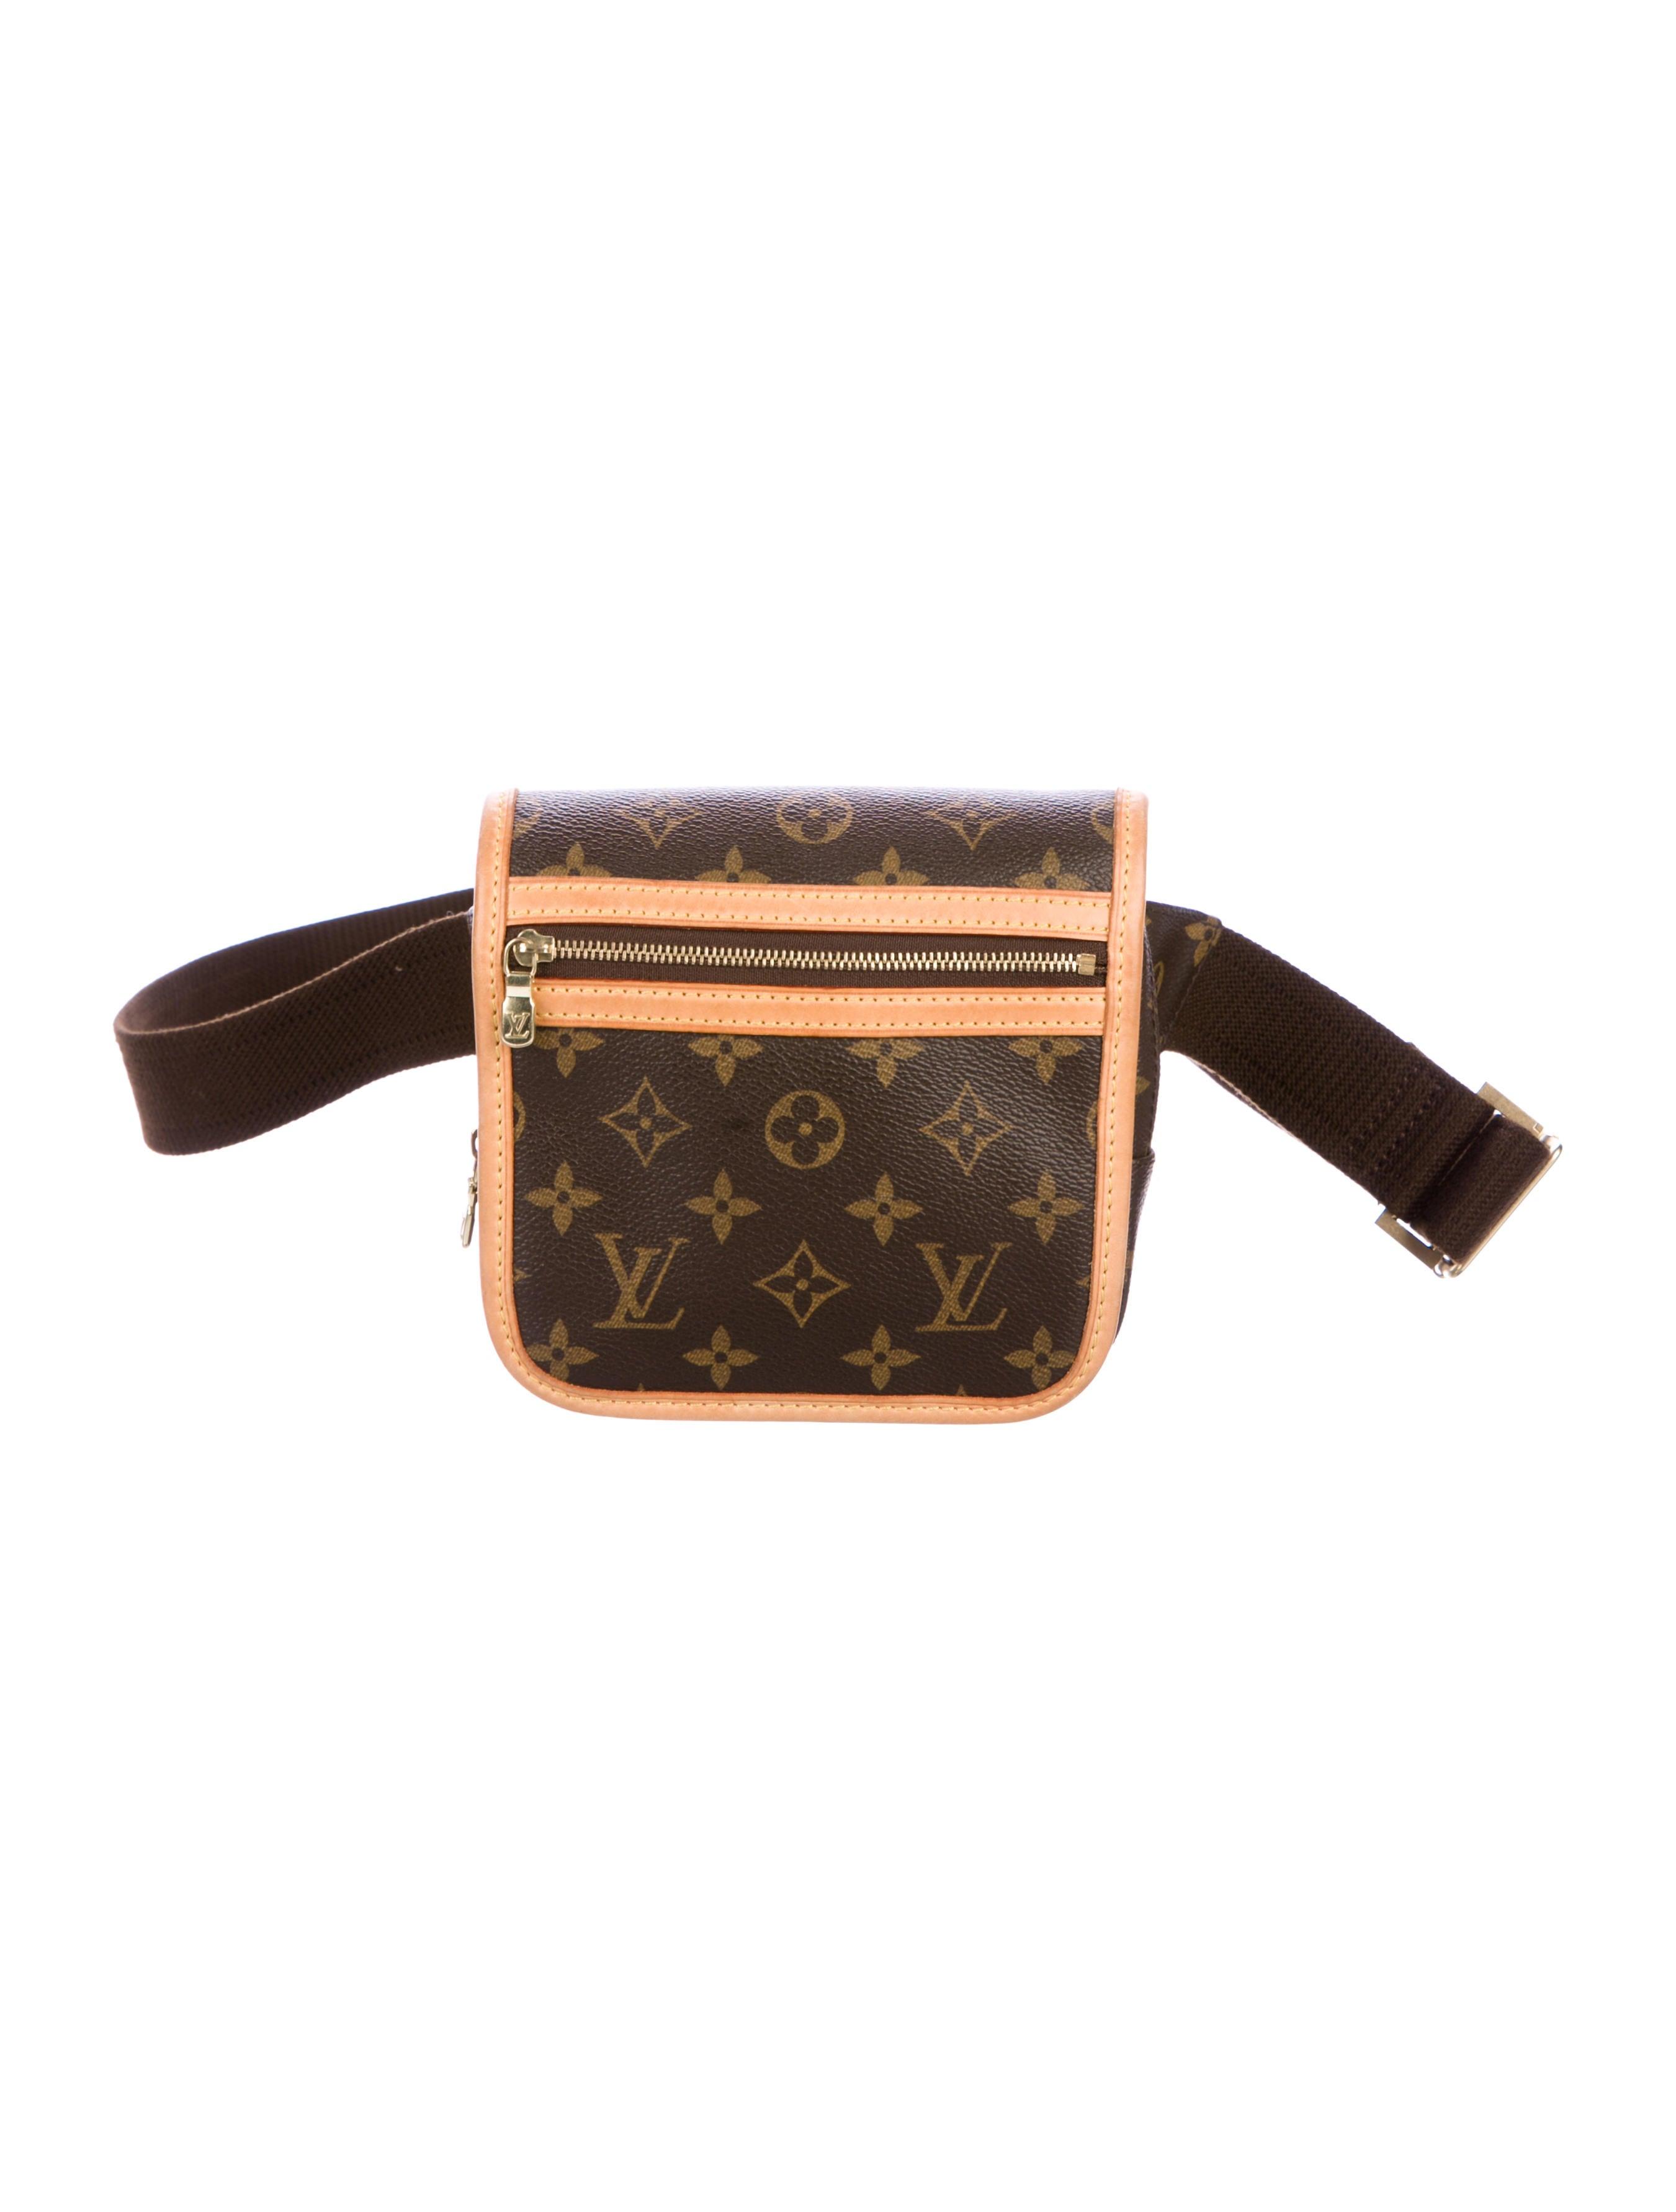 cd021441c176 Louis Vuitton Monogram Bosphore Waist Bag - Handbags - LOU191737 ...